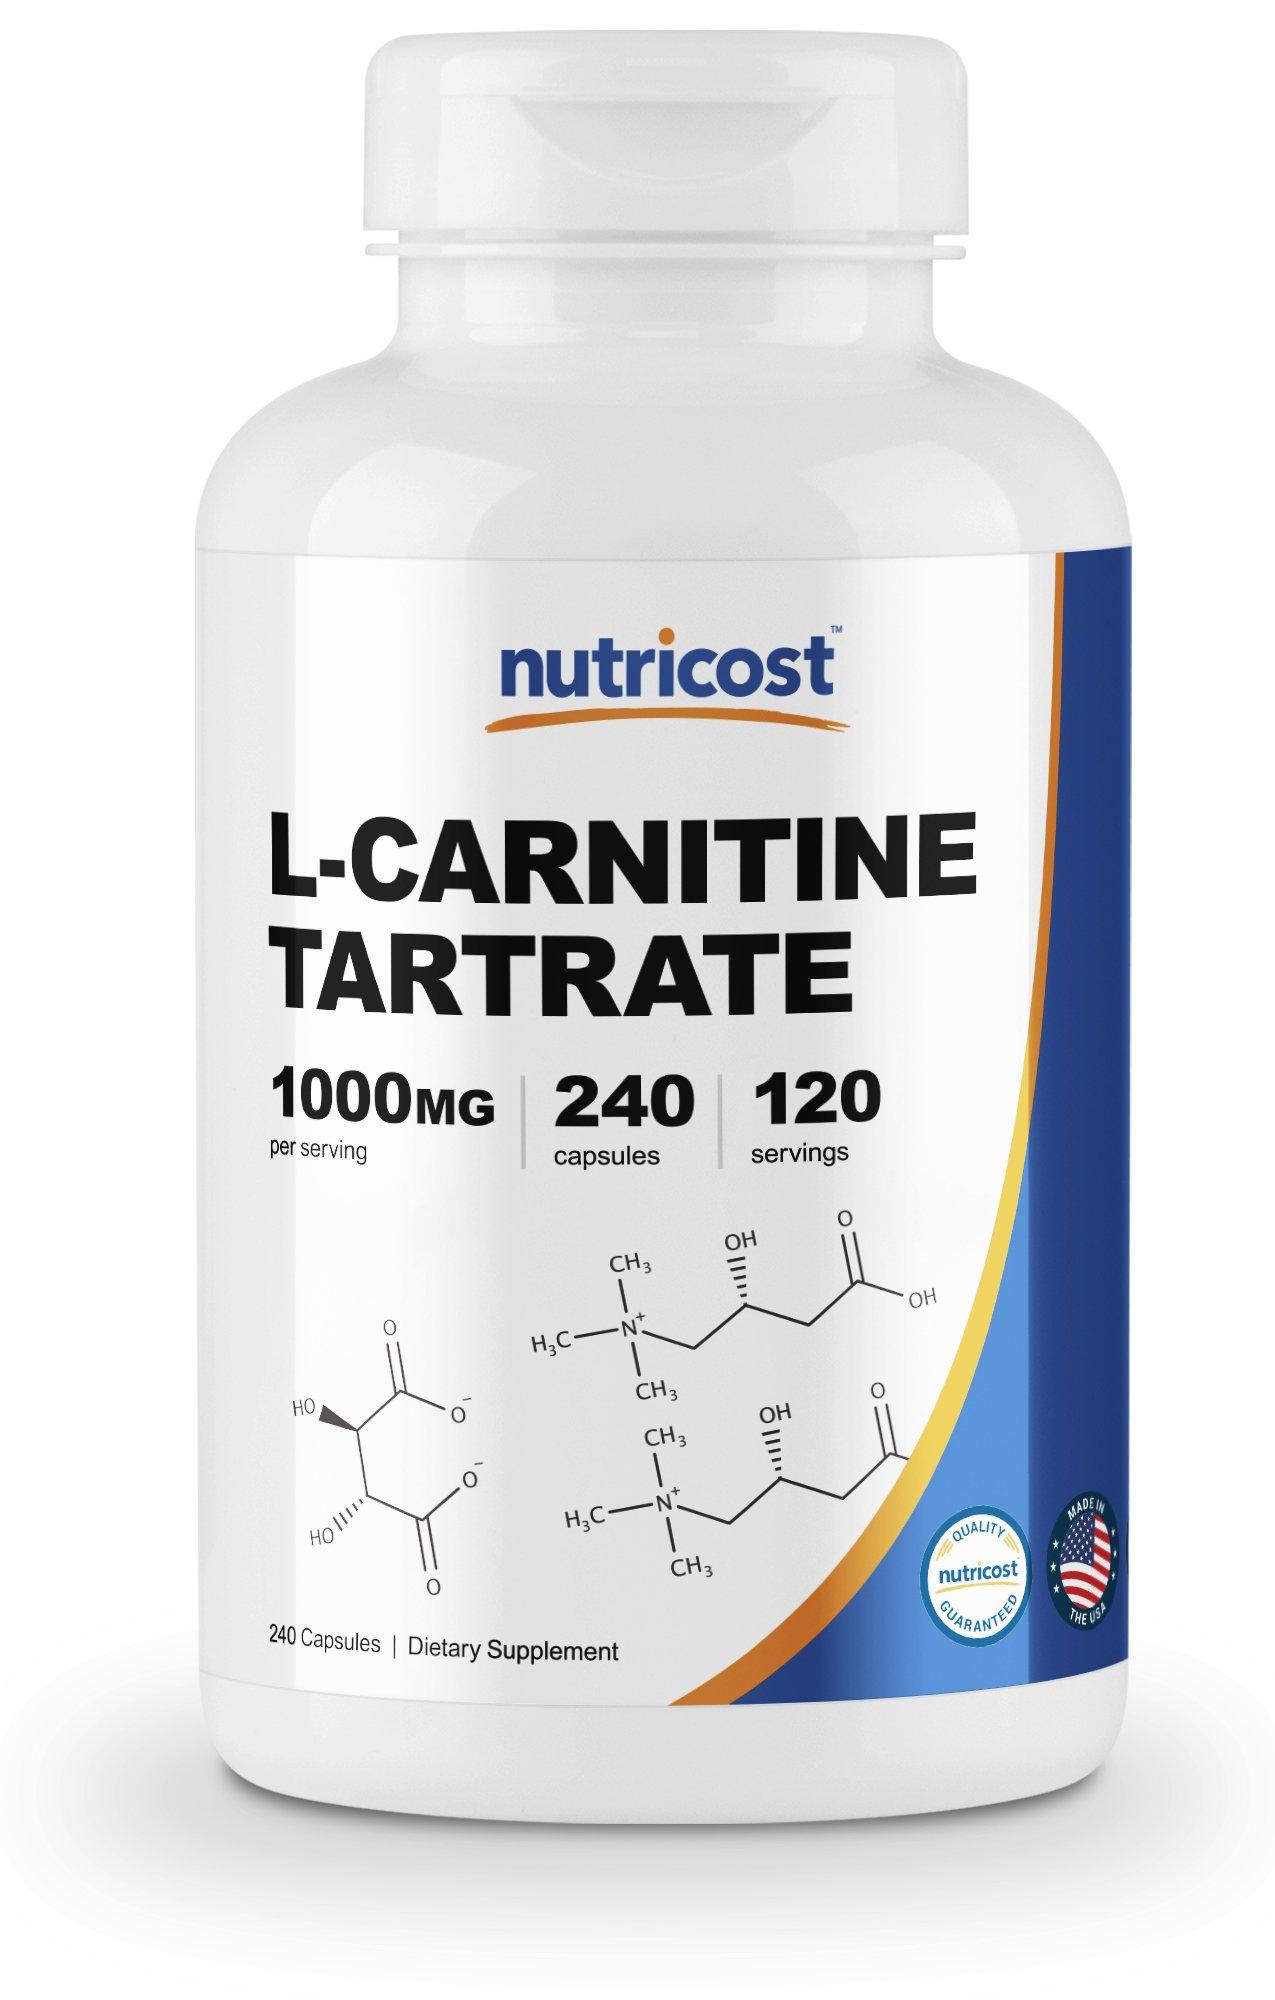 Nutricost L-Carnitine Tartrate 500mg, 240 Capsules - 1000mg per Serving